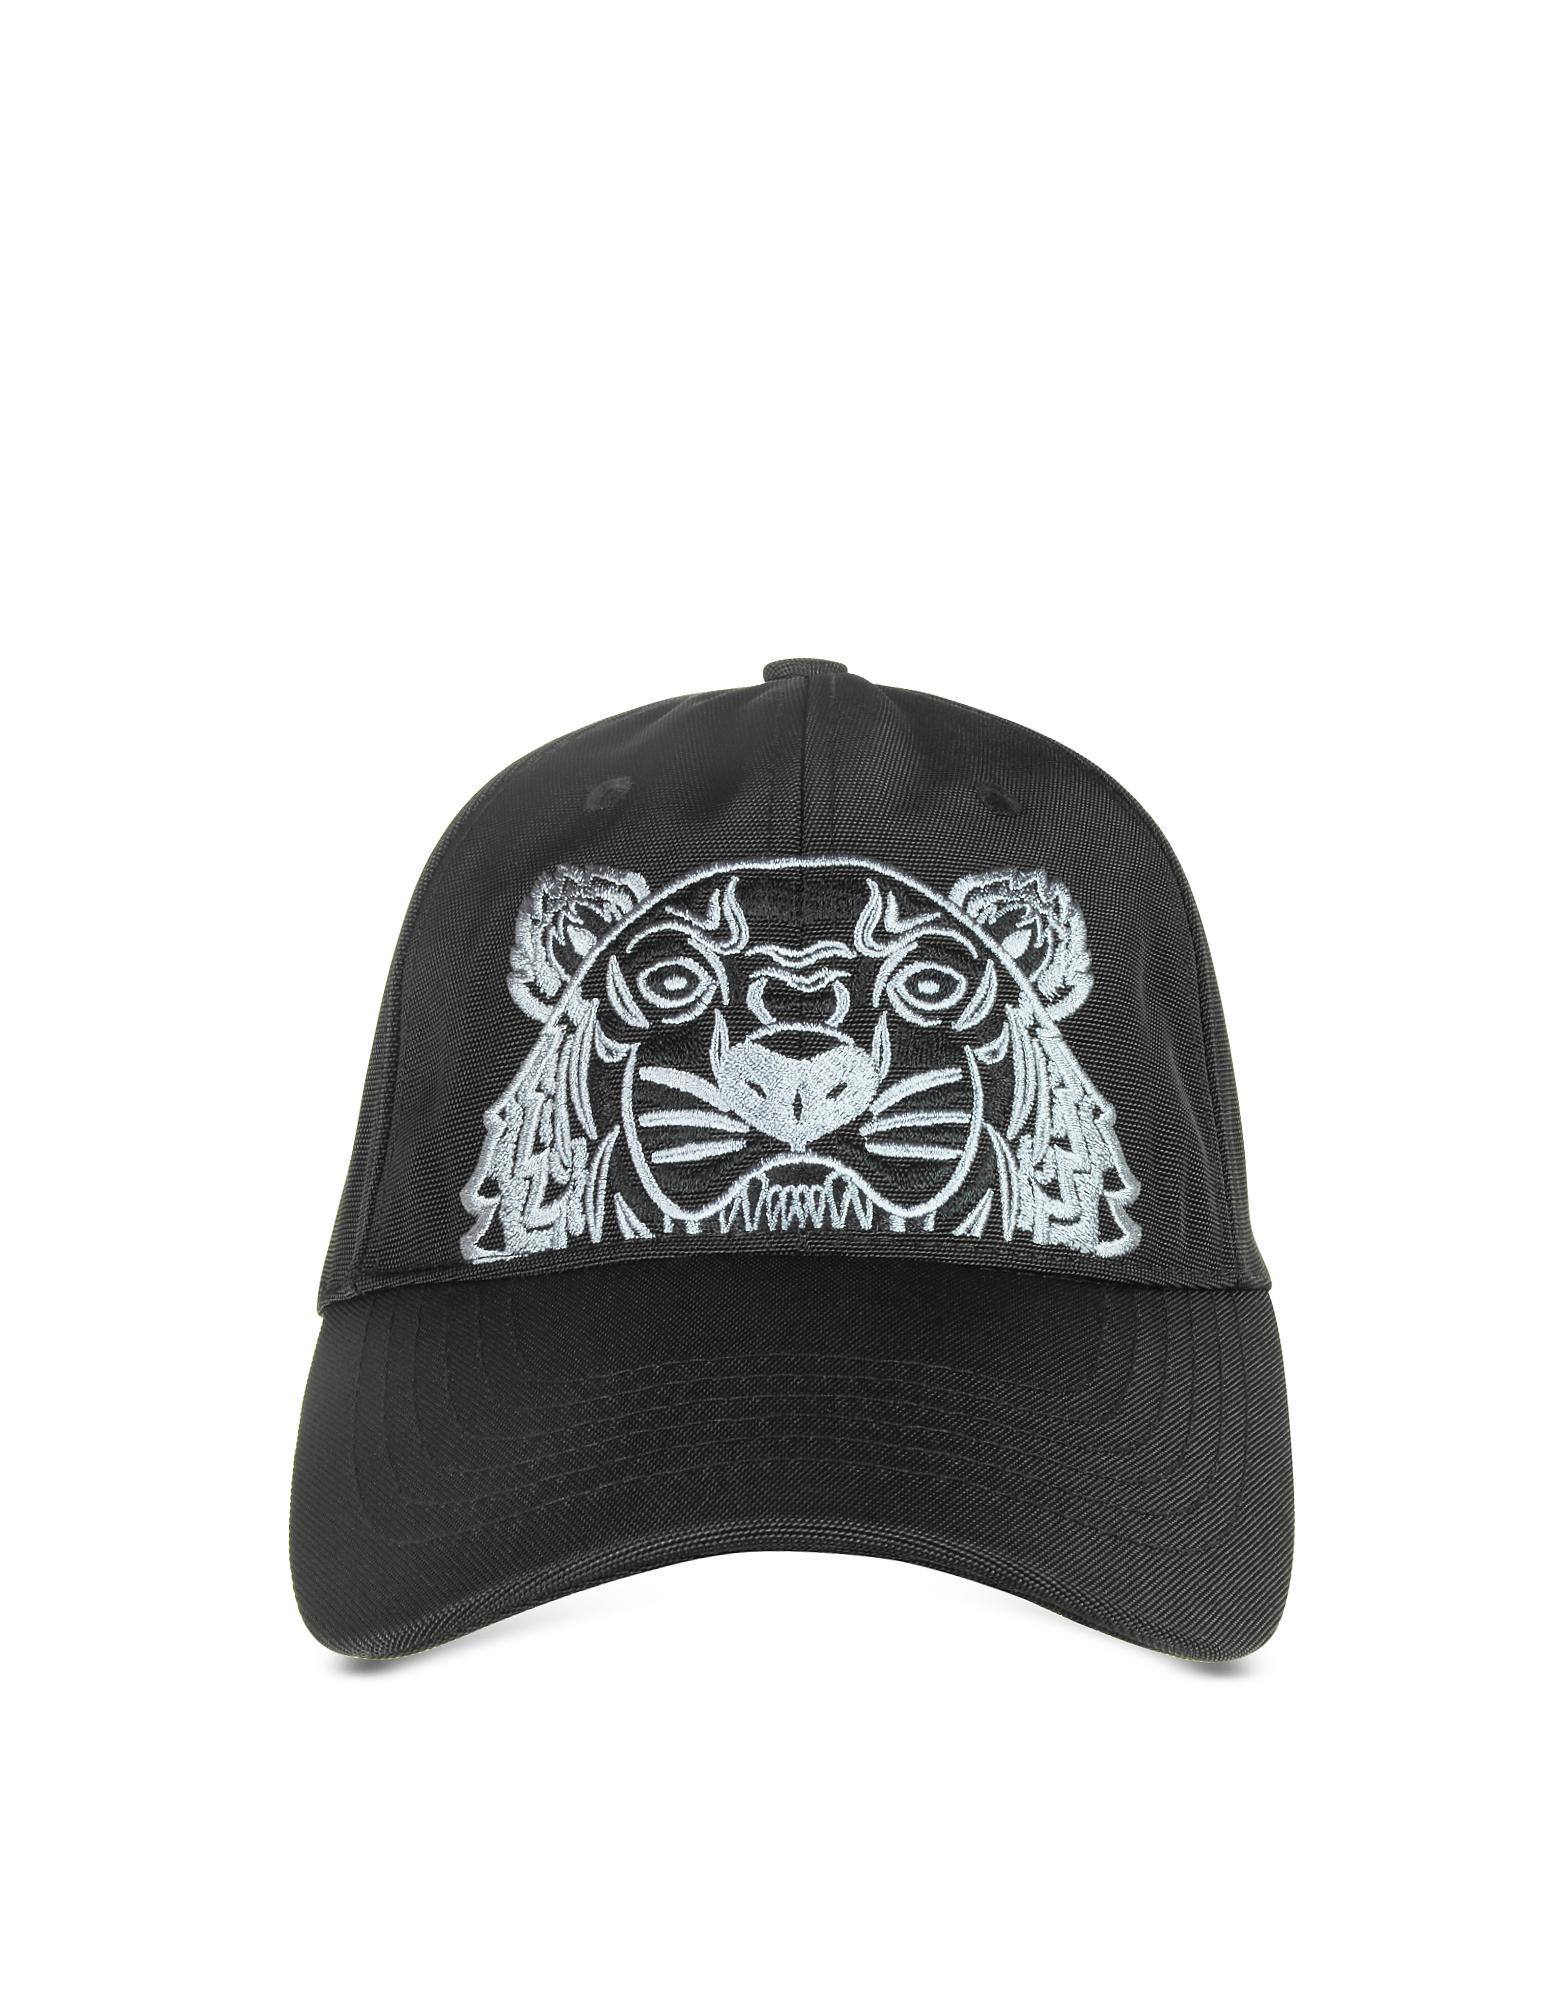 fbe4a92417b Lyst - Kenzo Black Canvas Tiger Baseball Cap in Black for Men